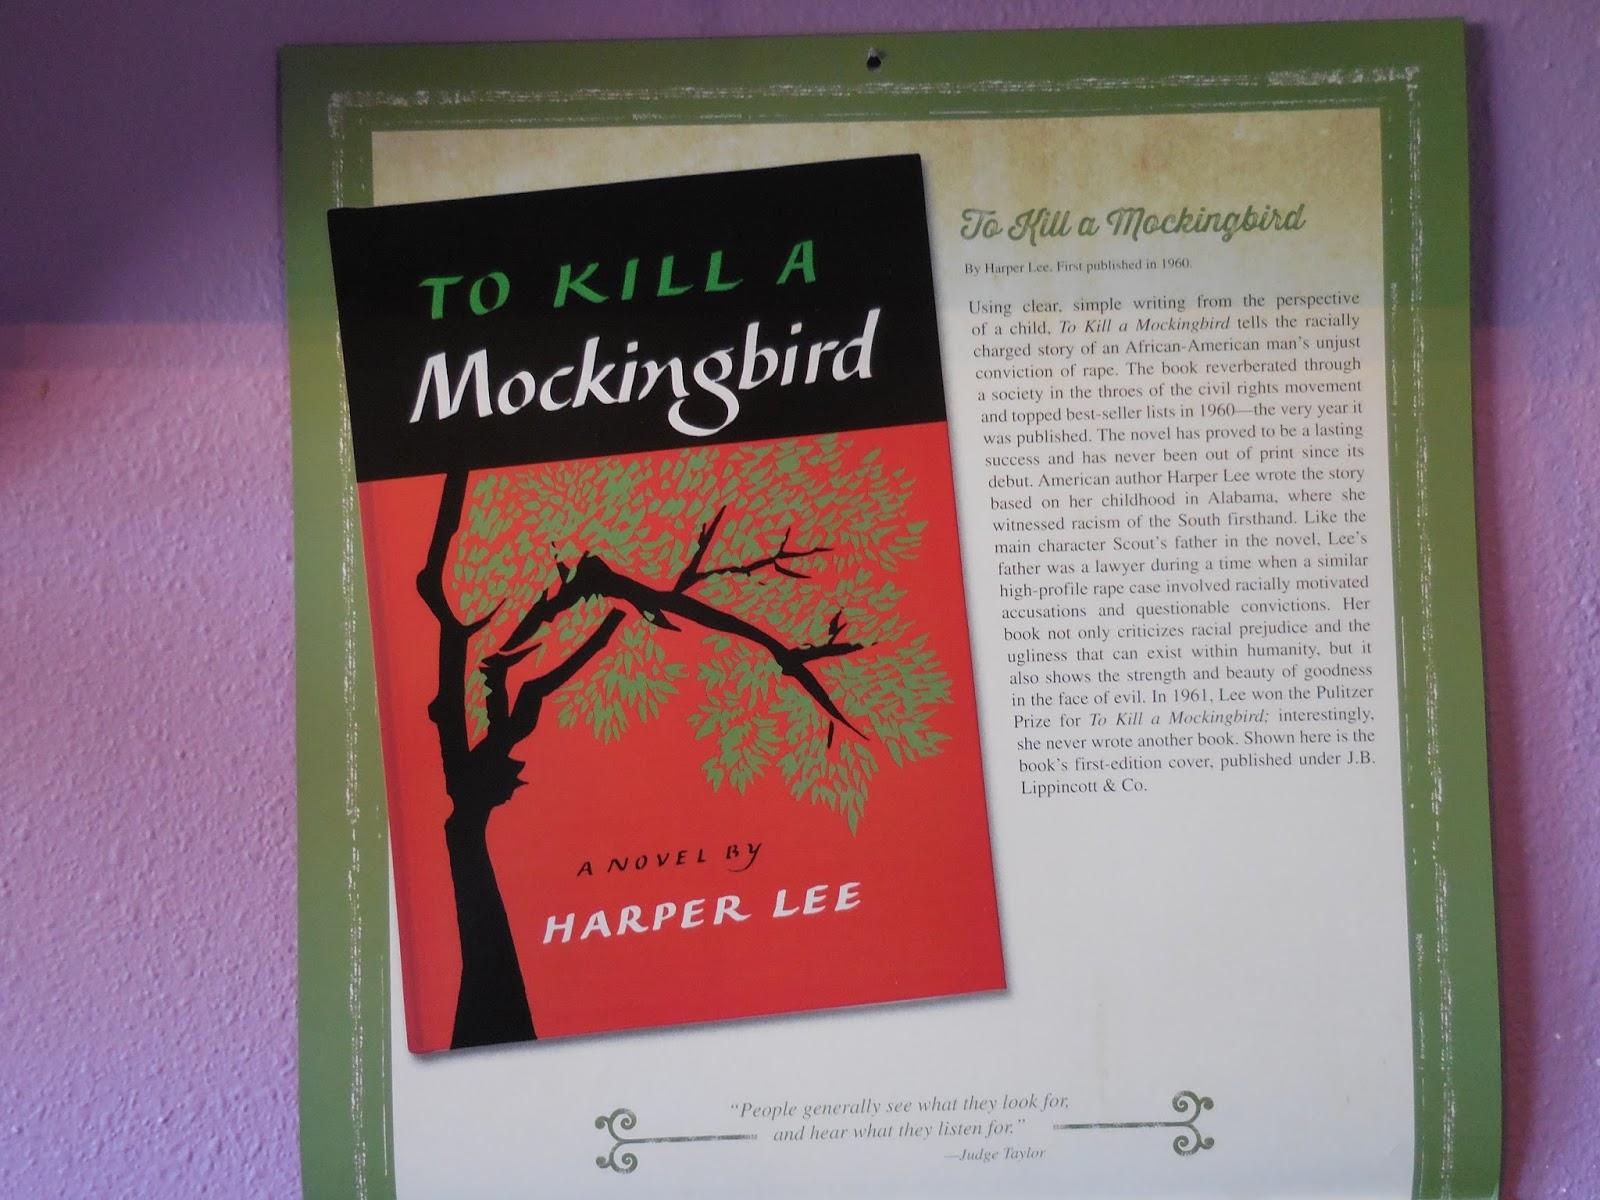 racism kill mockingbird harper lee